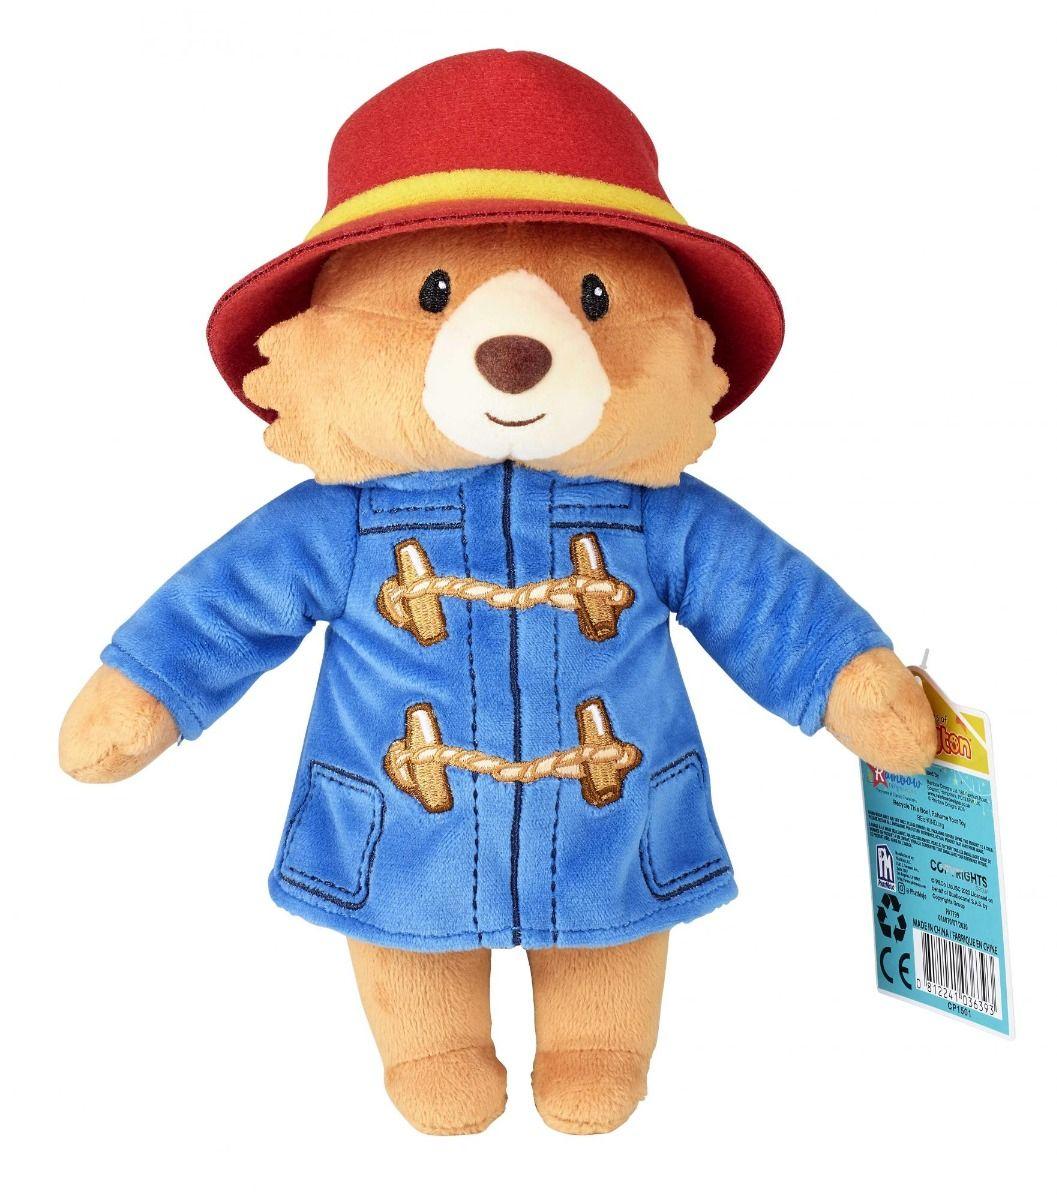 Paddington 22cm Collectible Plush Soft Toy by Rainbow Designs PA1799